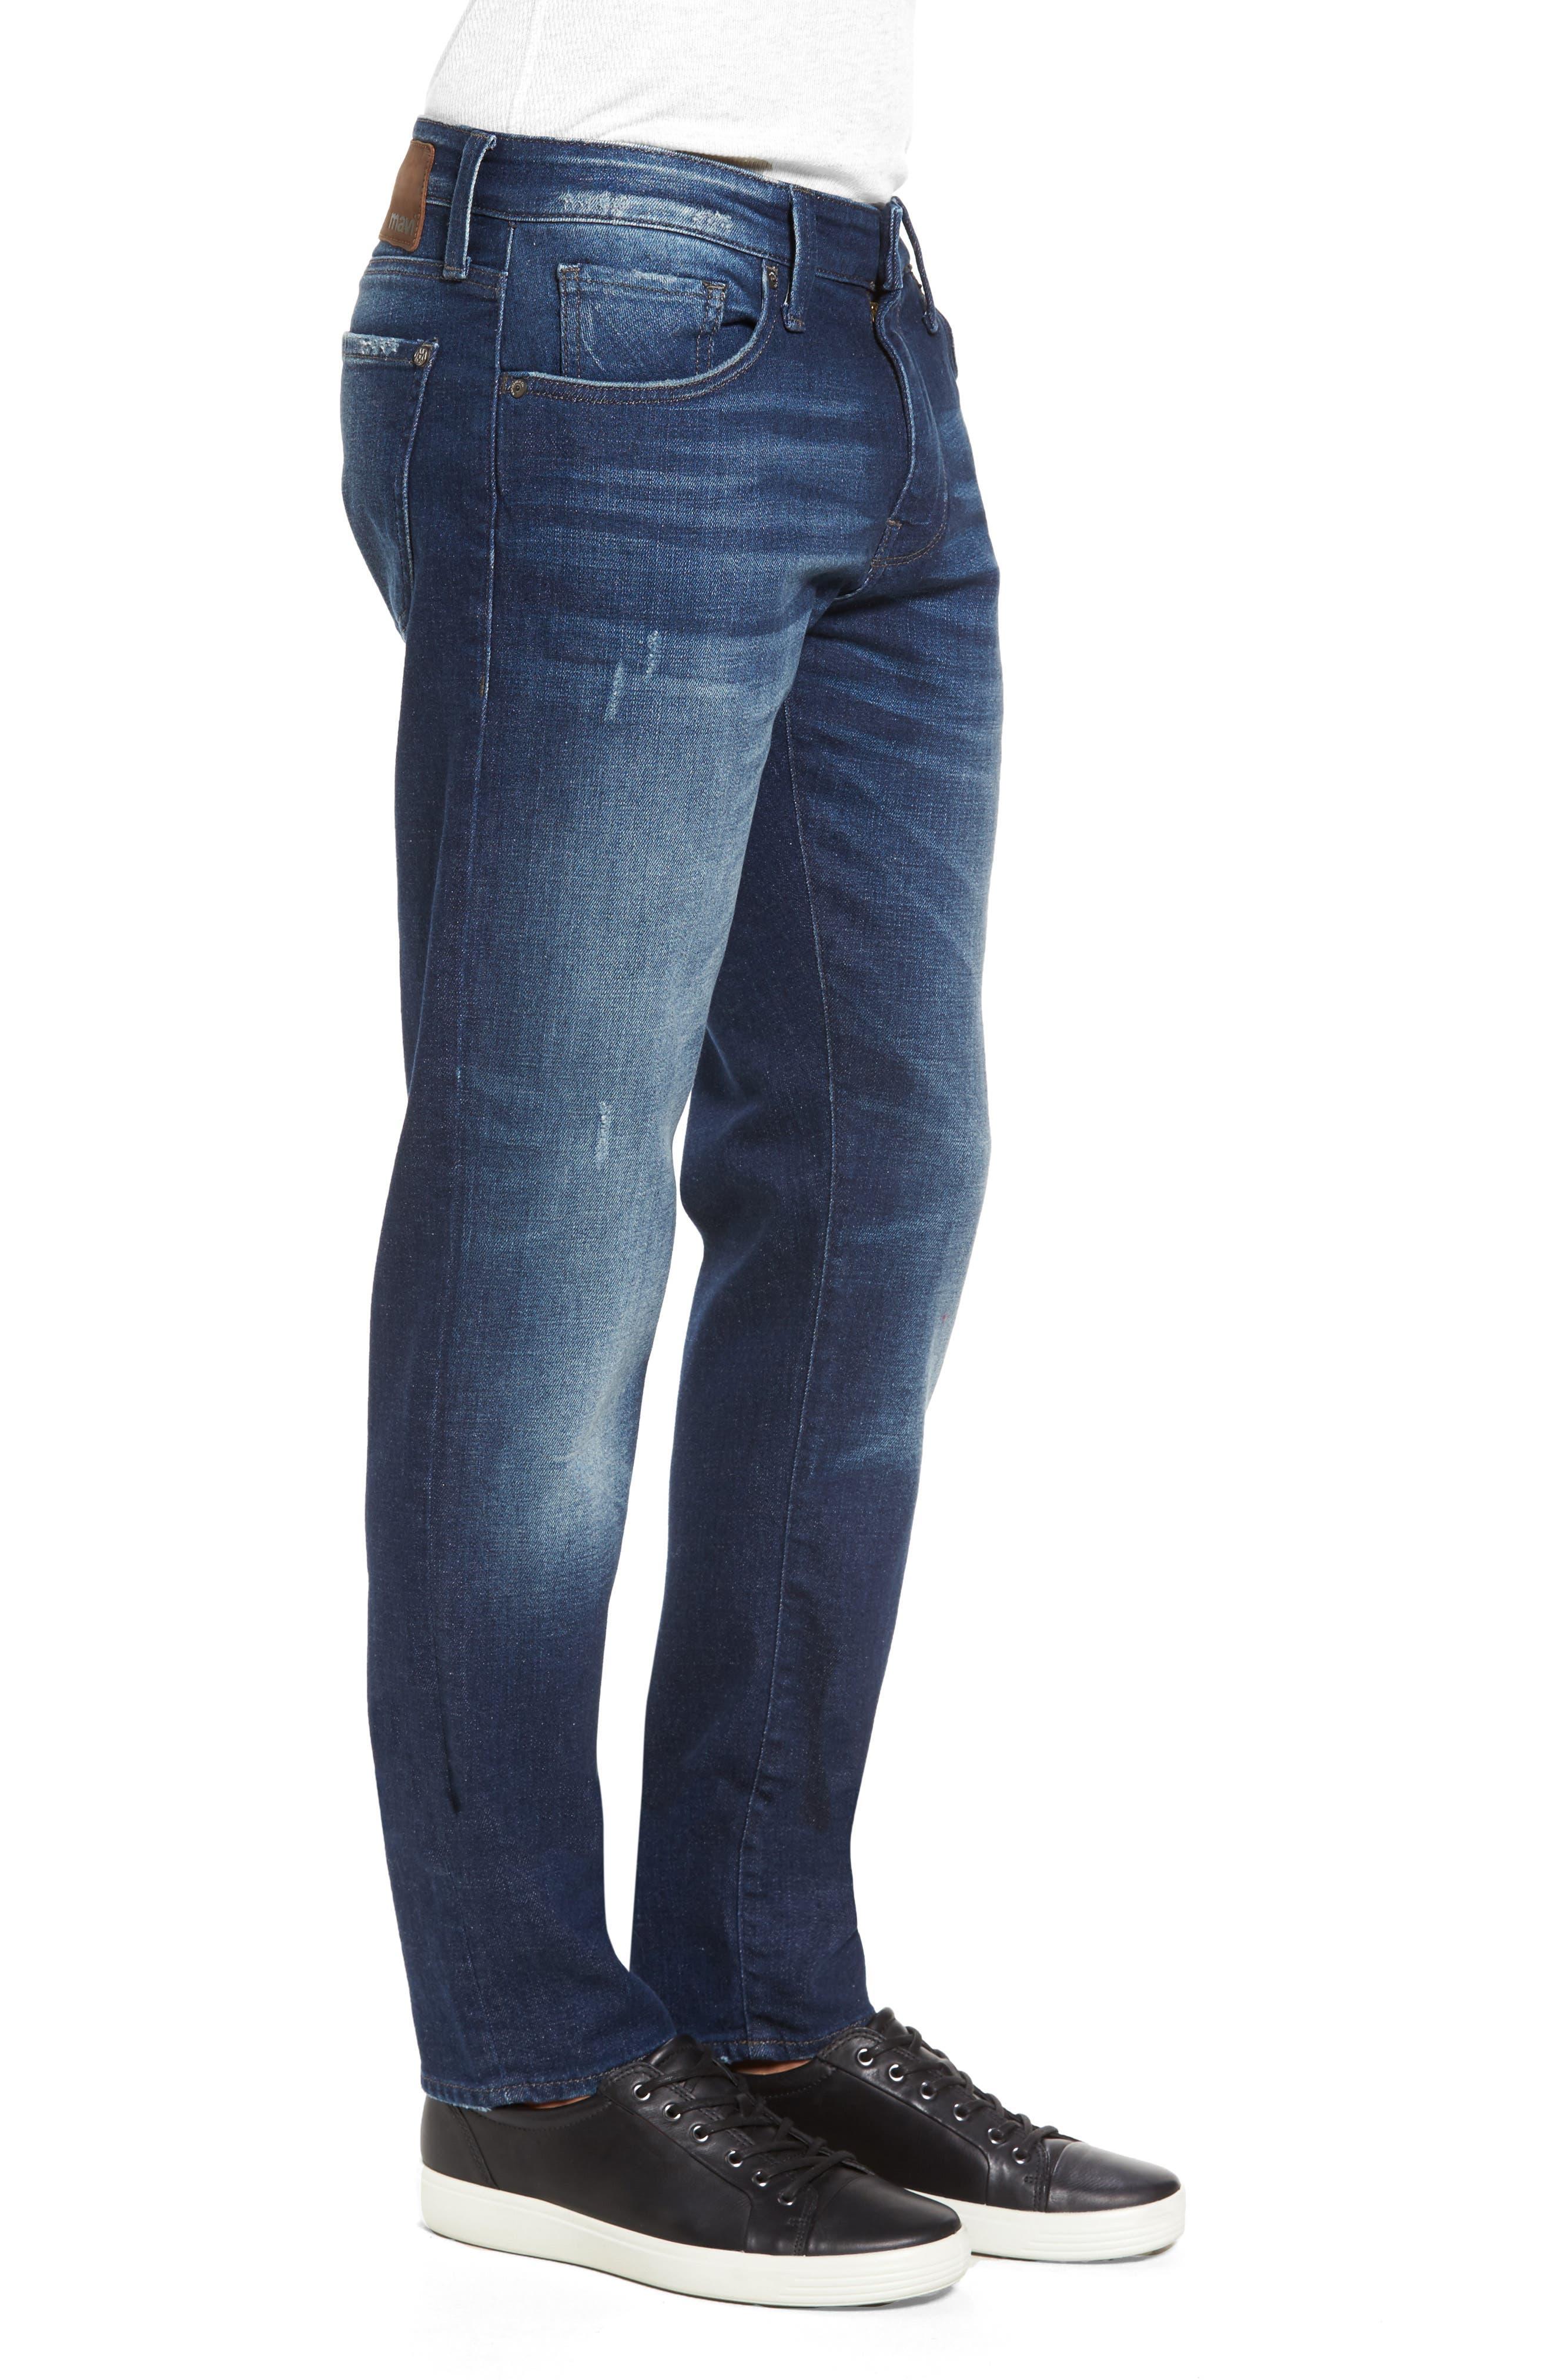 Jake Easy Slim Fit Jeans,                             Alternate thumbnail 3, color,                             401